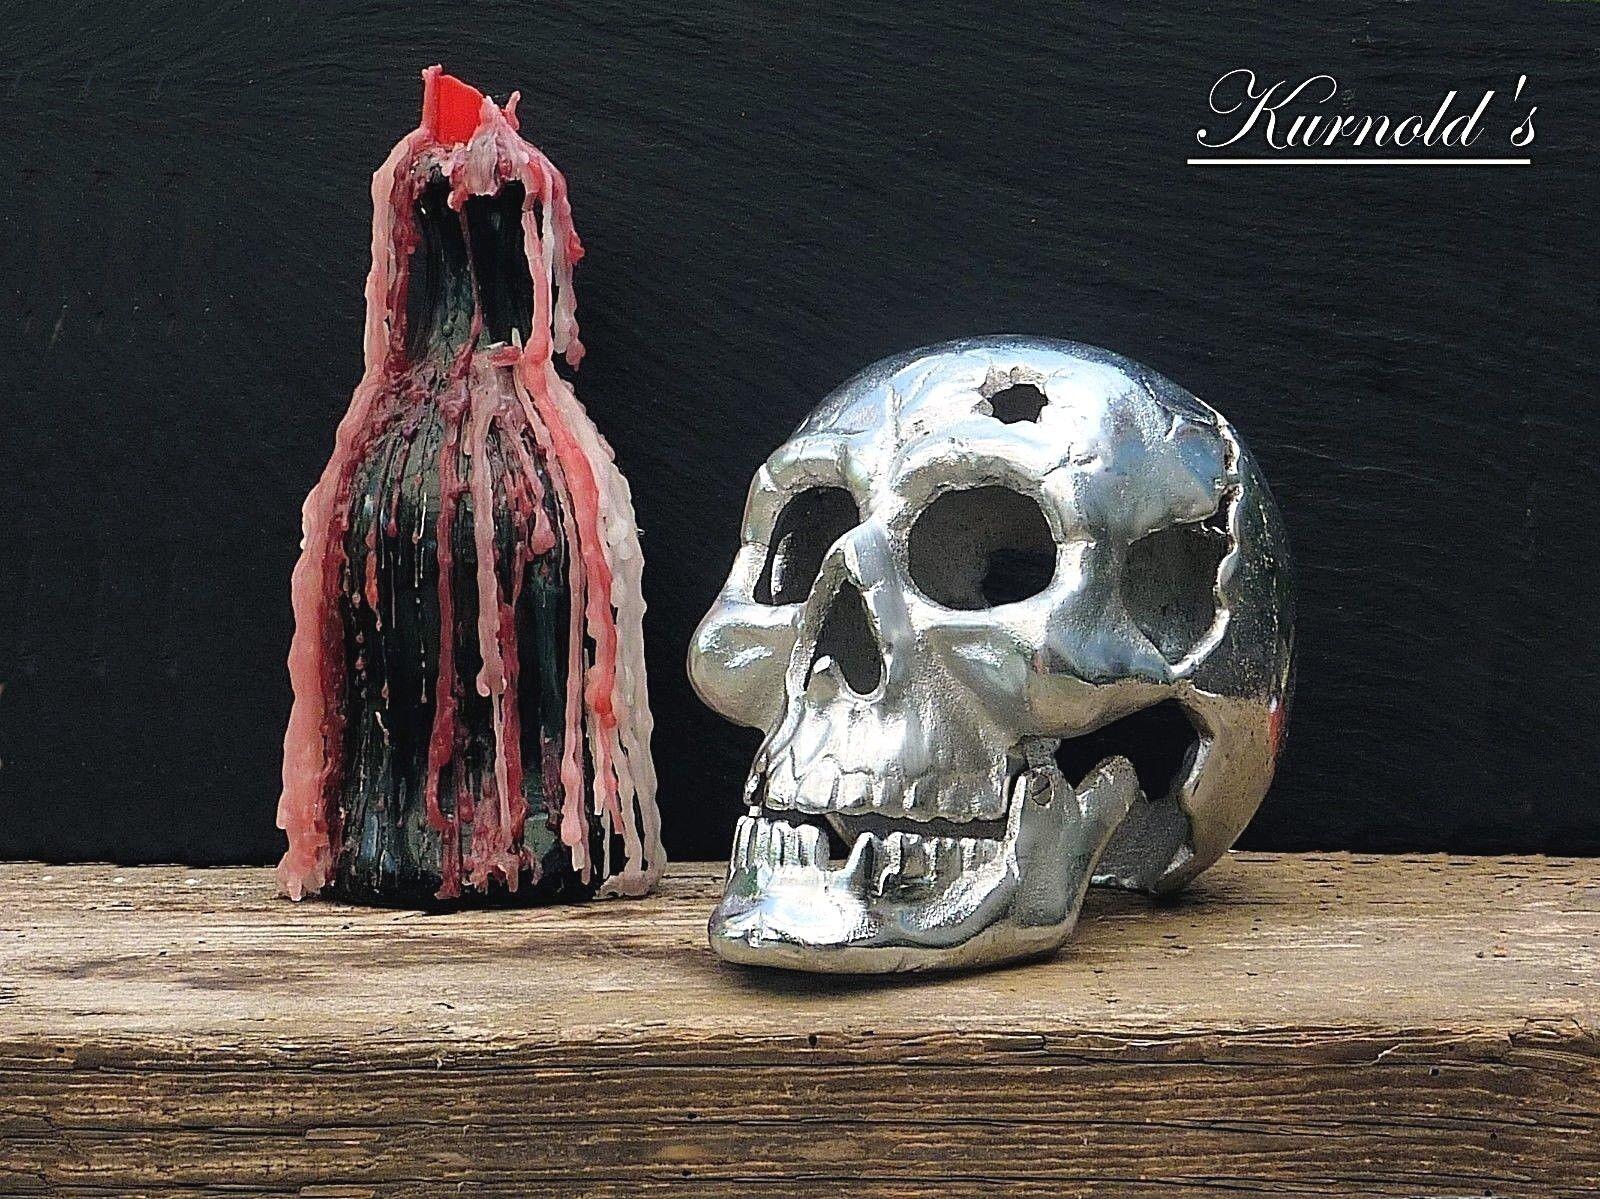 1 squelette crane tête de mort mort Pirate Halloween Event DECO fer kurnolds 0298